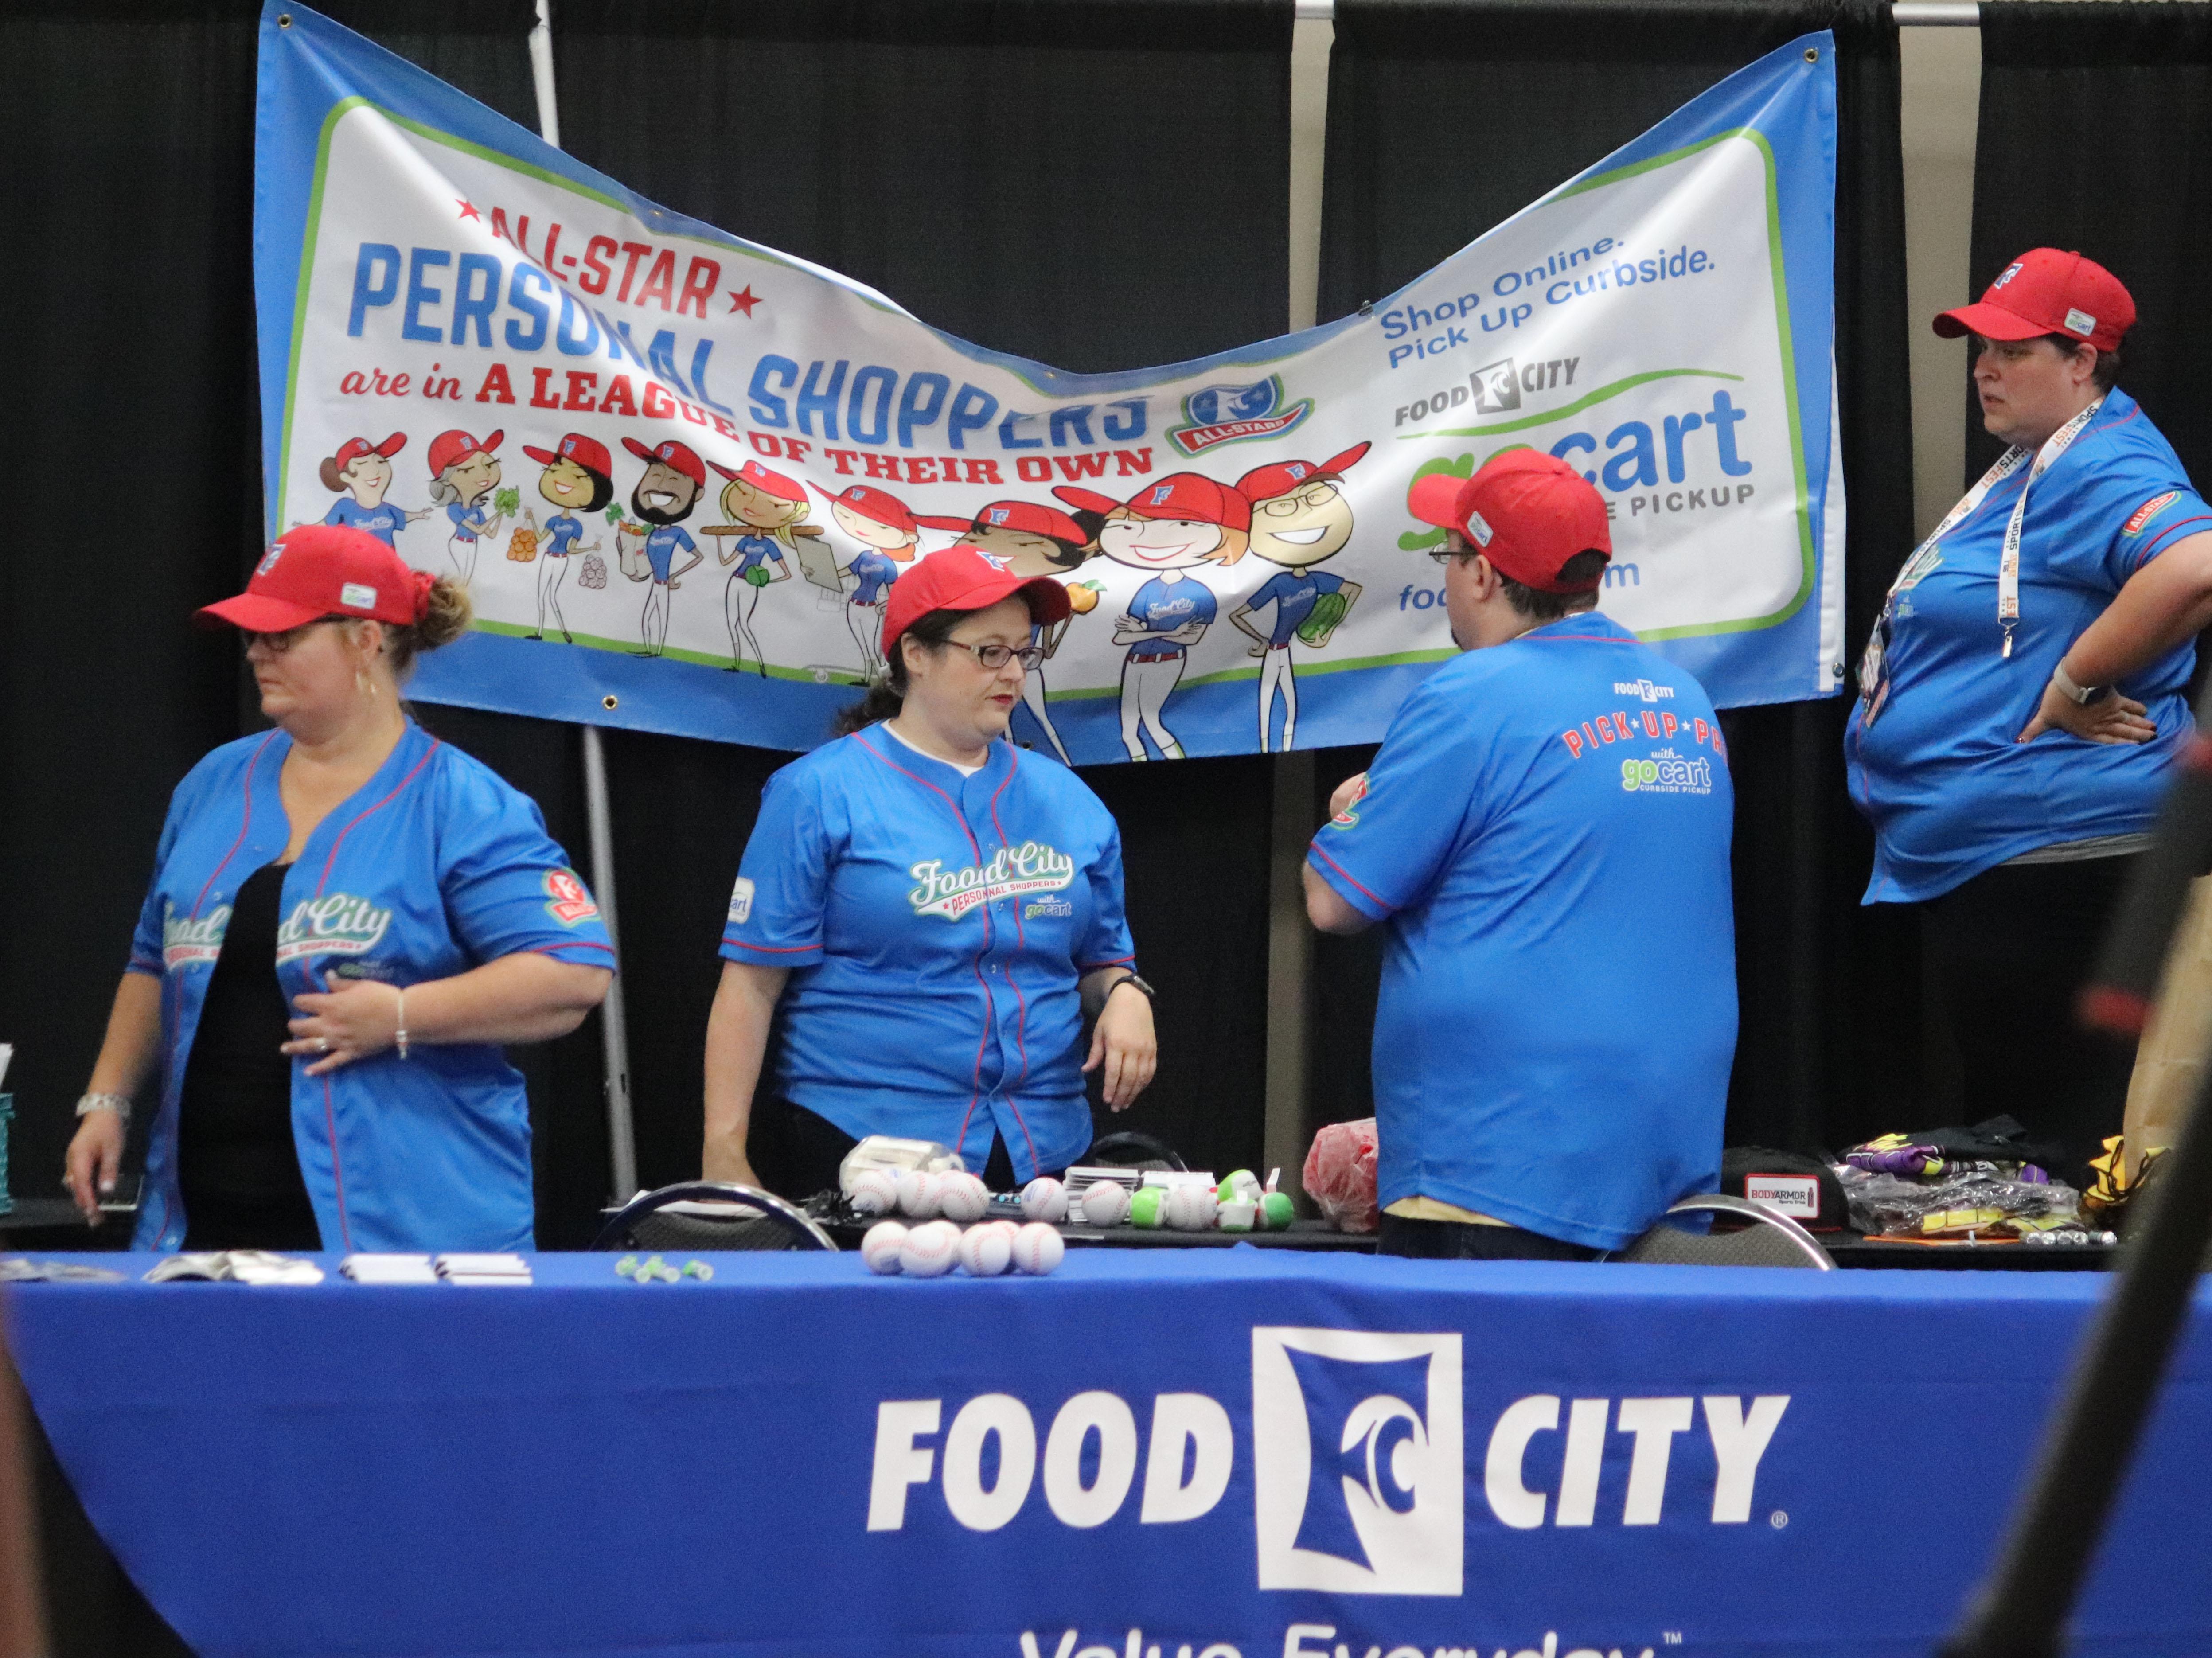 Food City 2